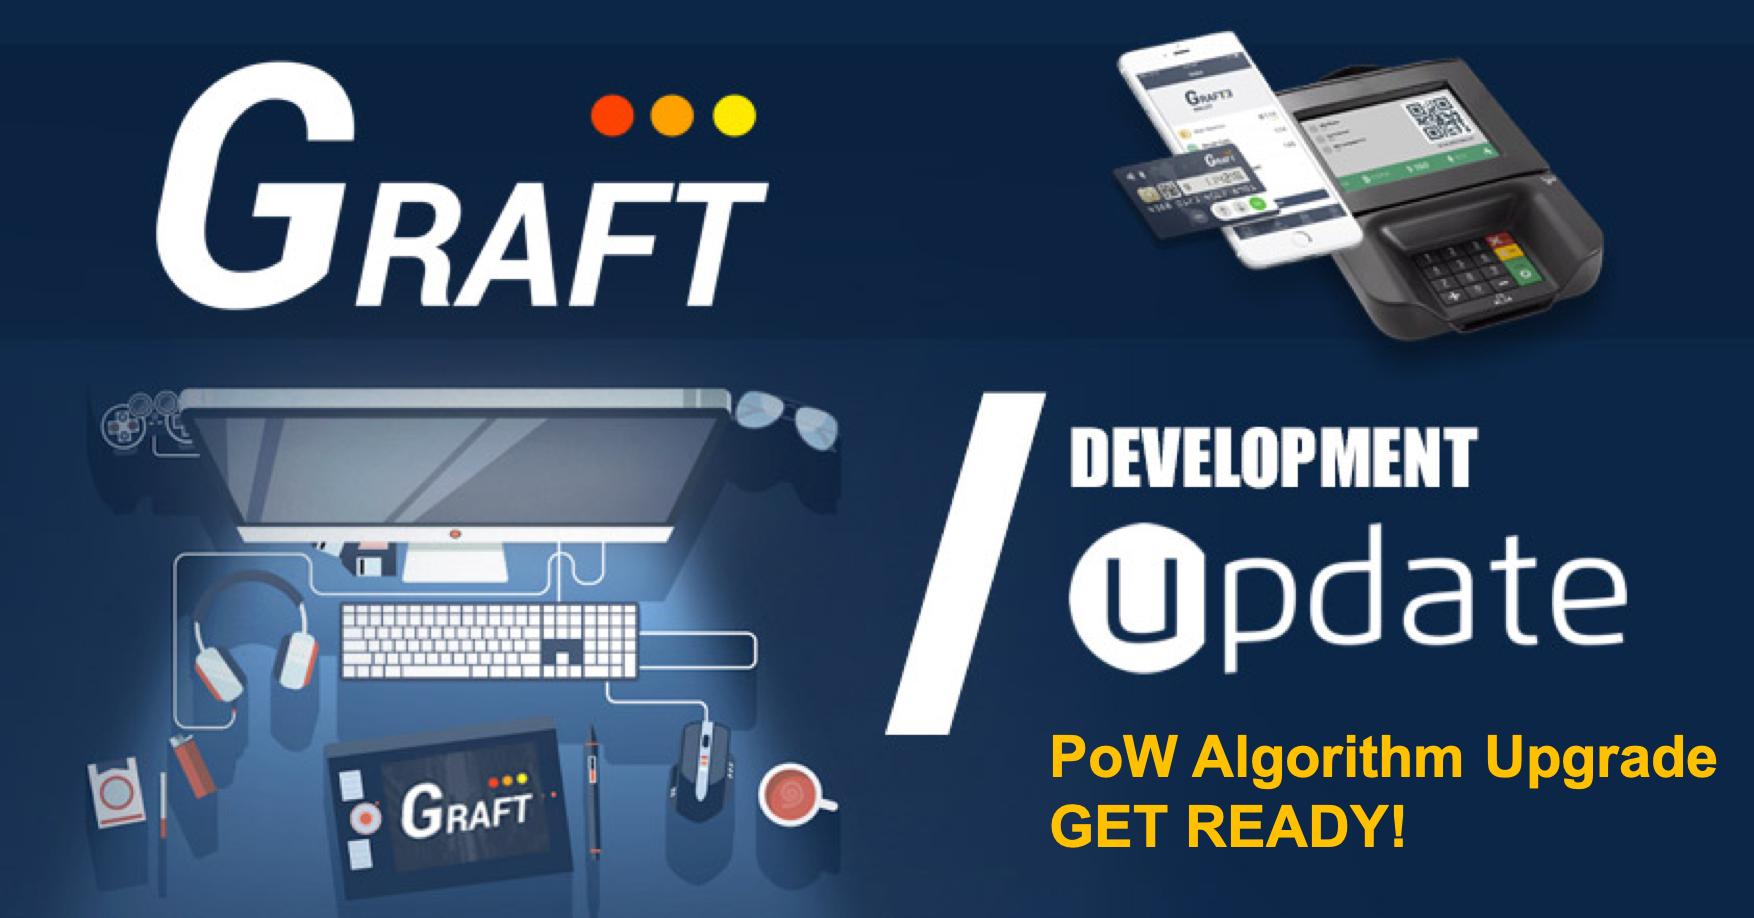 PoW Algorithm Update - GET READY! - Graft Blockchain